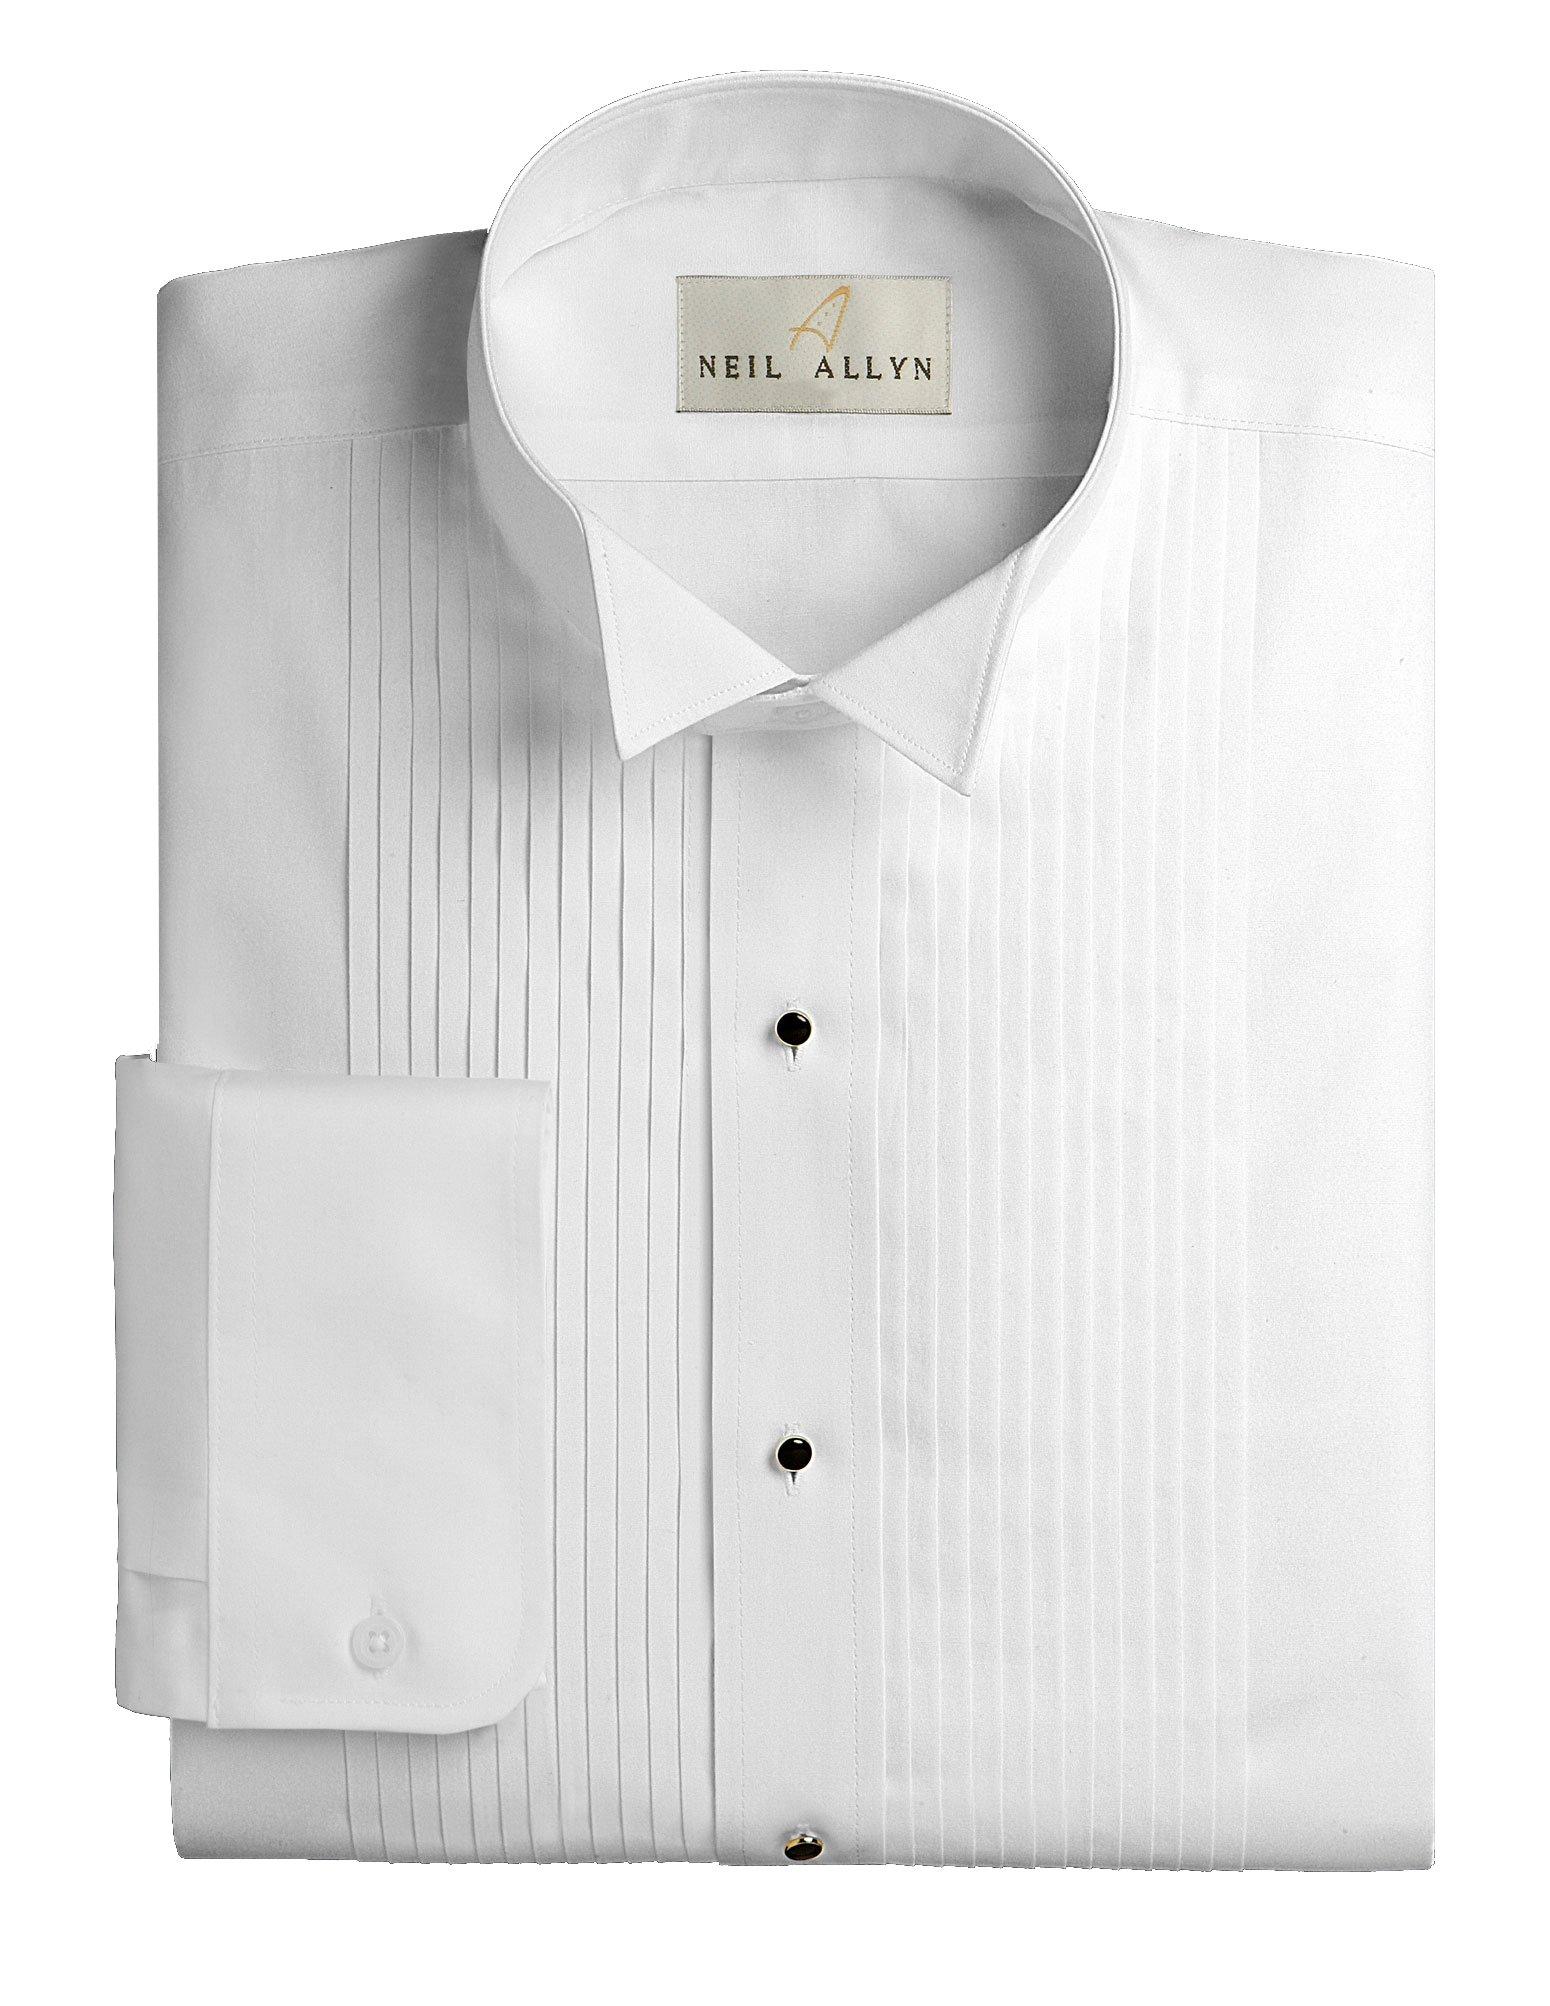 Neil Allyn Men's Tuxedo Shirt Poly/Cotton Wing Collar 1/4 Inch Pleat - L-5 (16-16.5'' Neck - 34/35'' Sleeve Length) by Neil Allyn